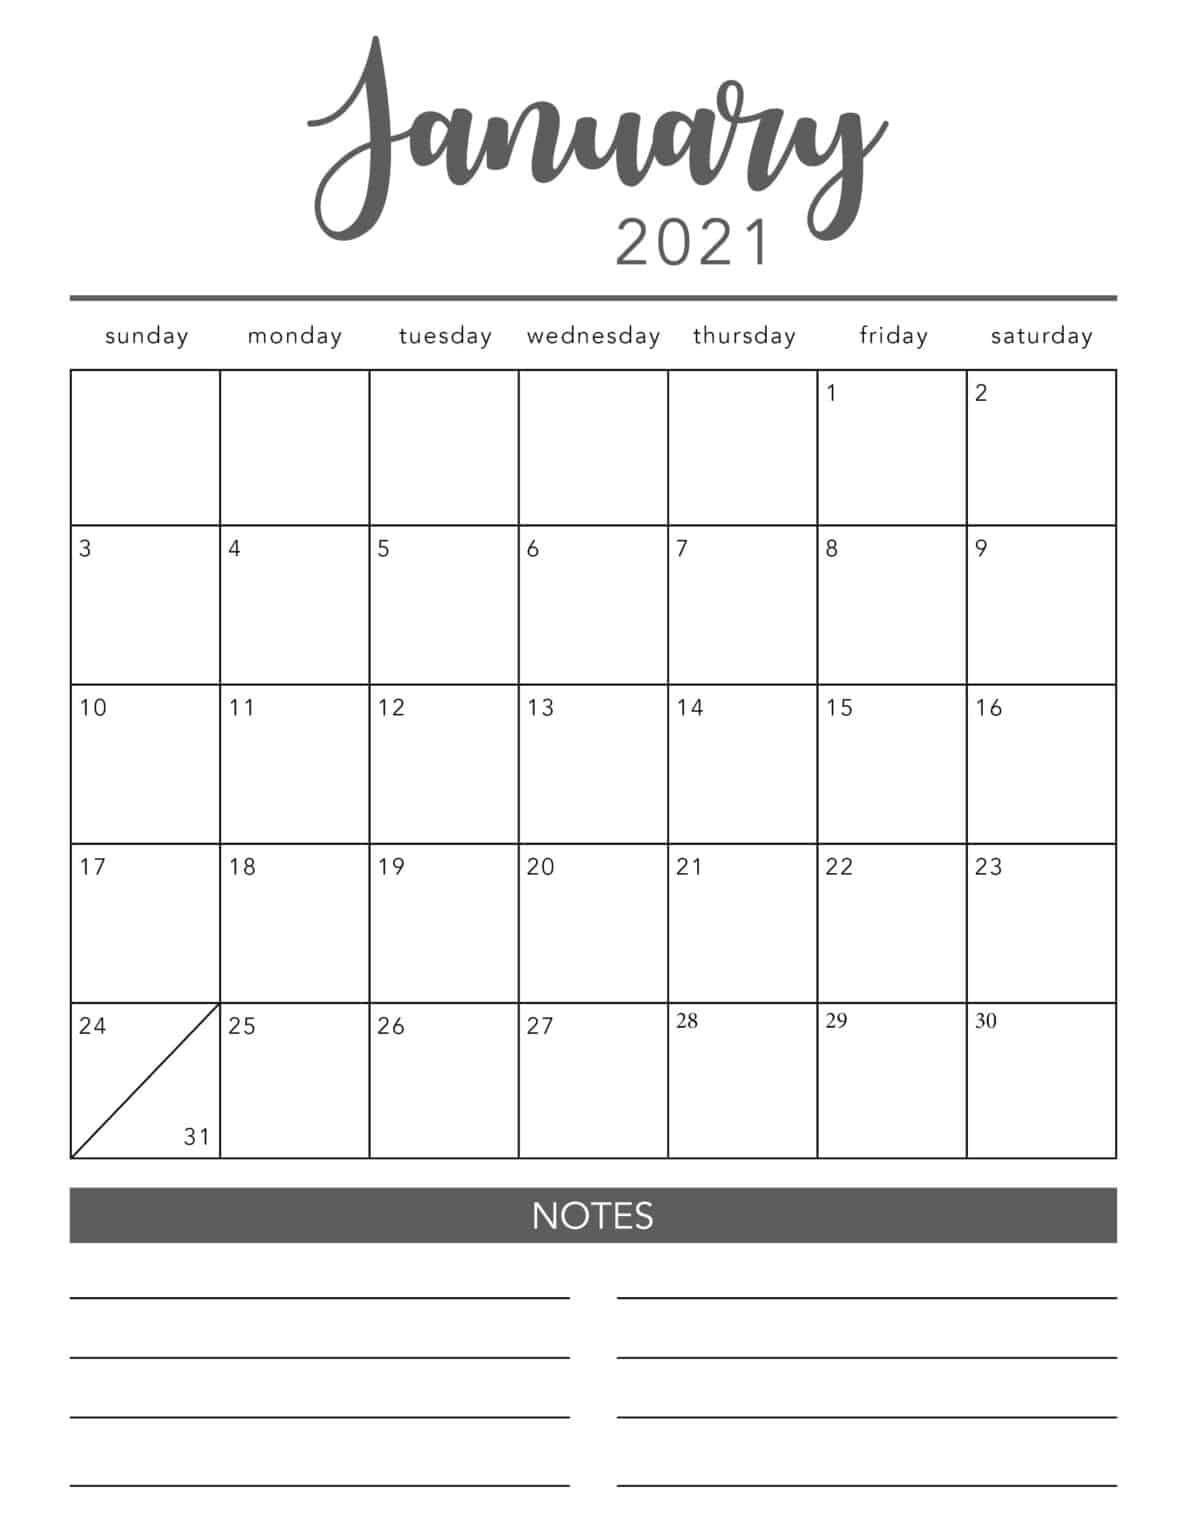 FREE 2021 Printable Calendar Template (2 colors!) I